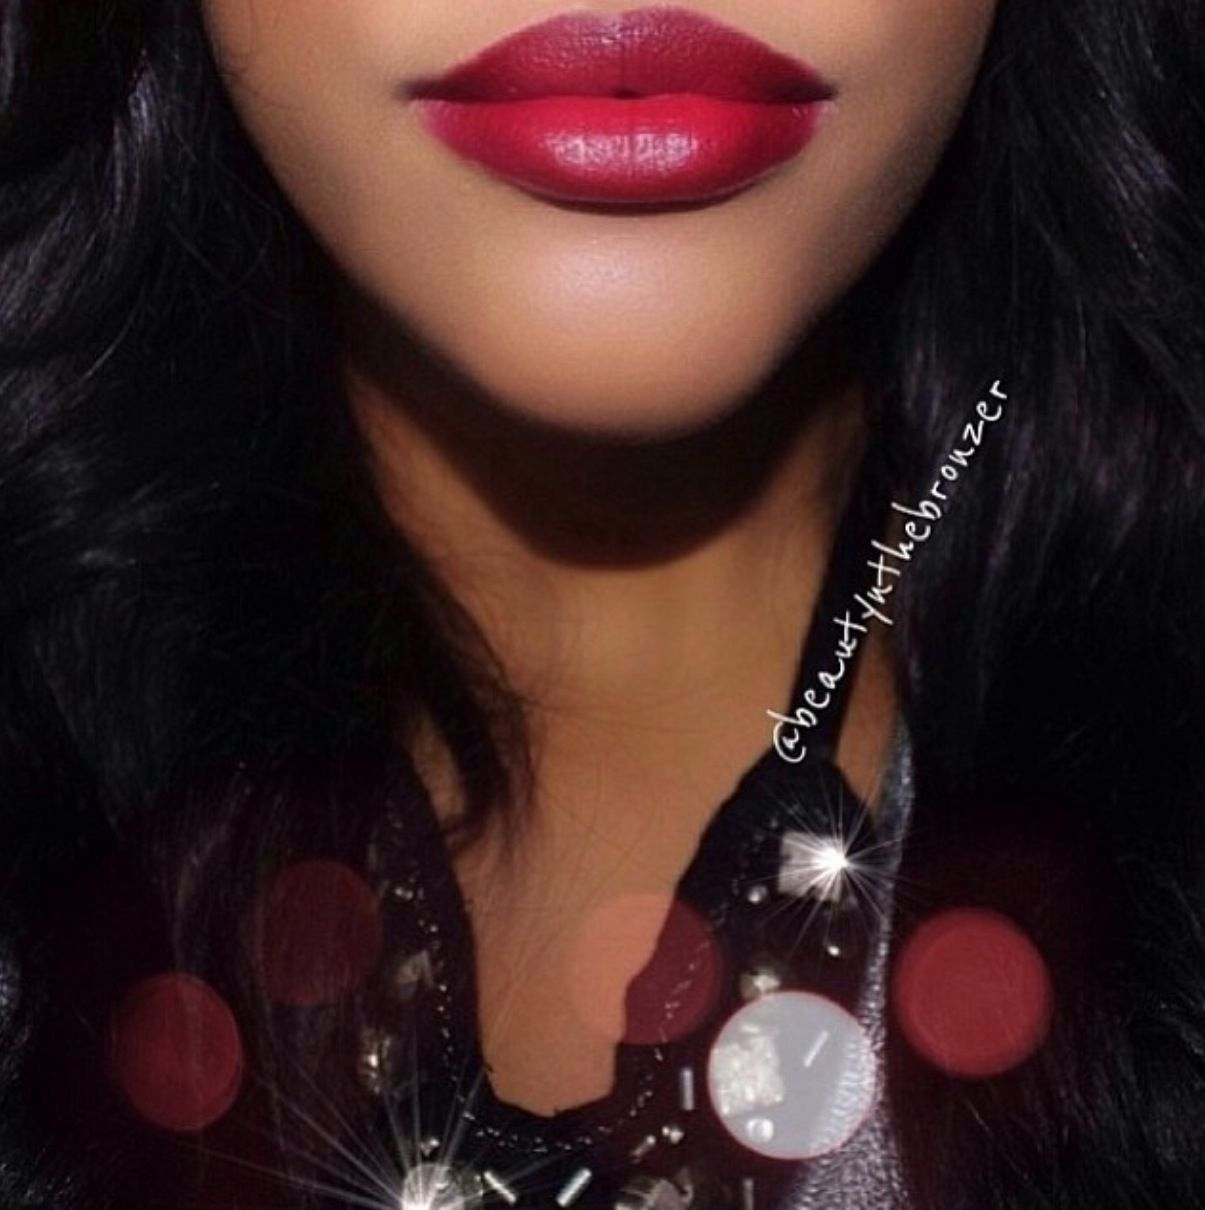 Frankie Rose Cosmetics deep red wine lipstick